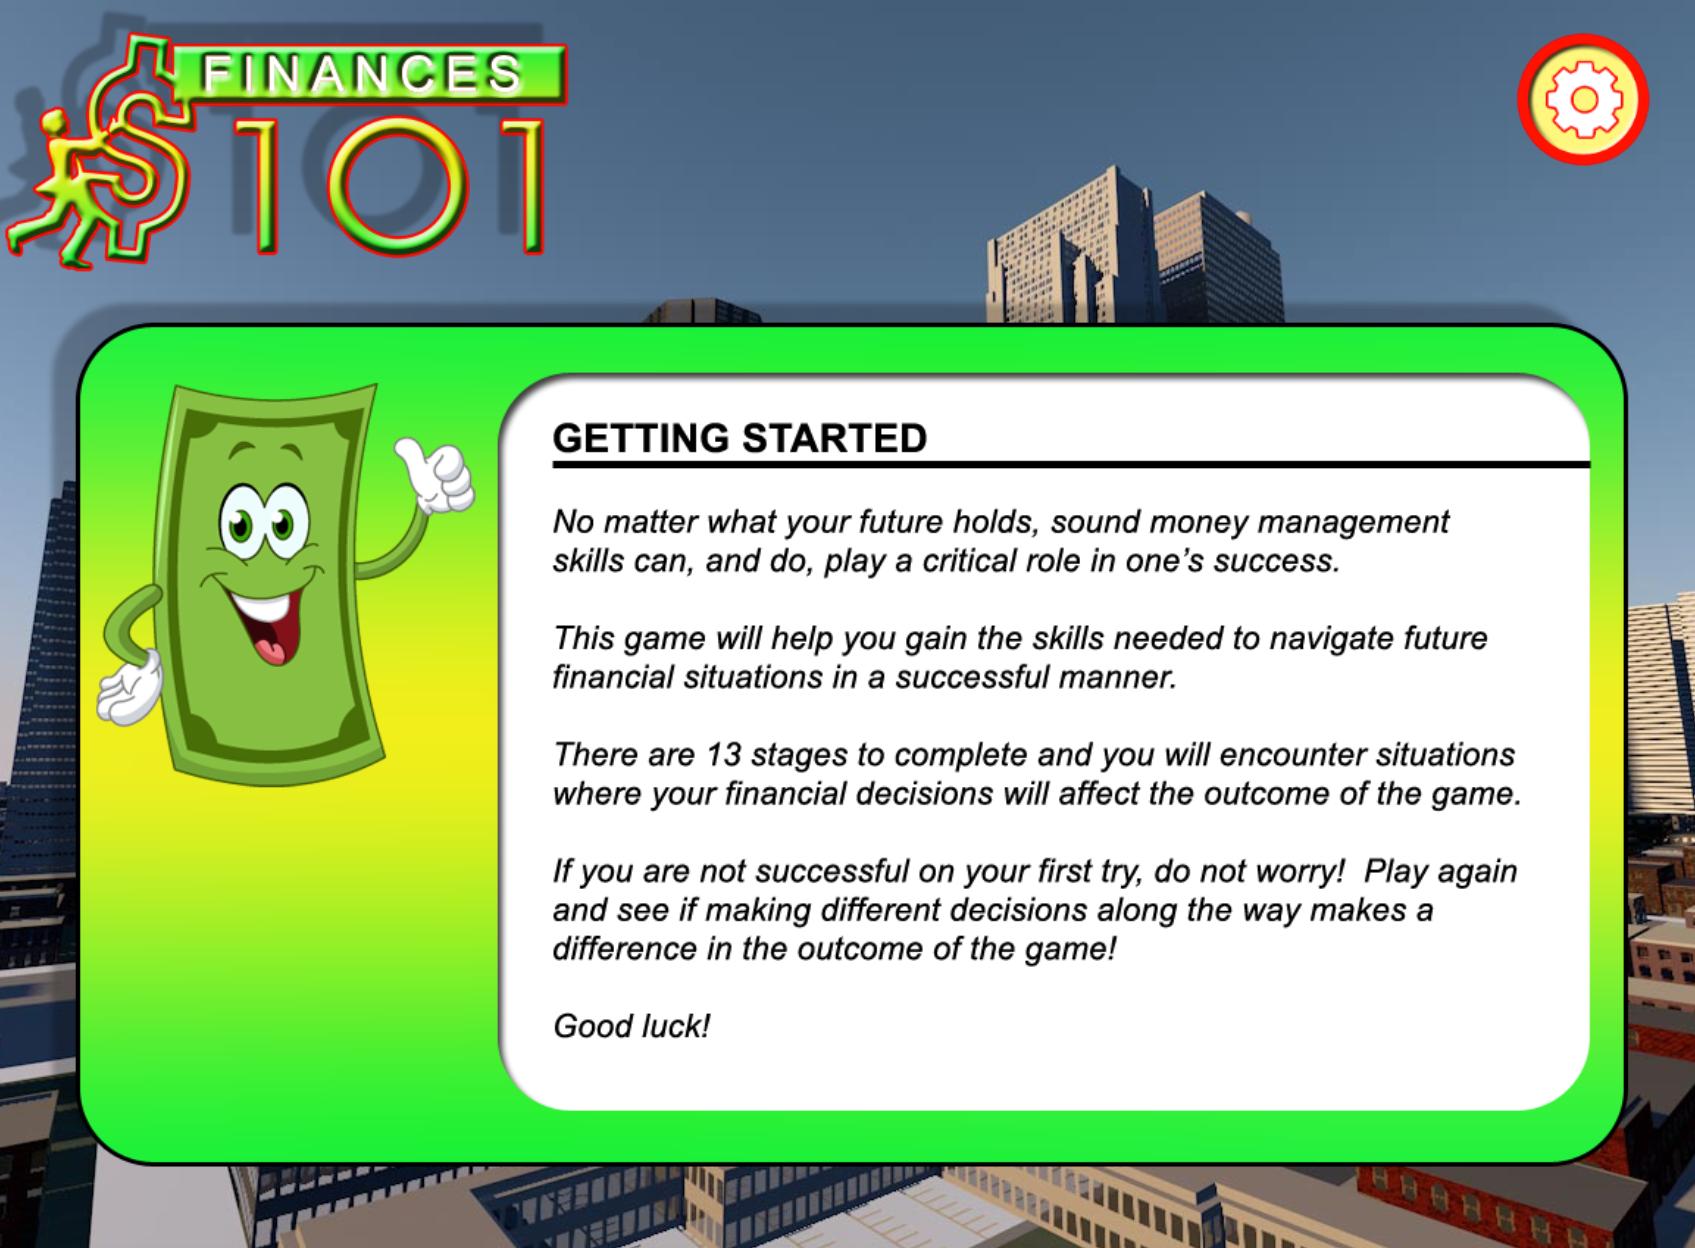 Finances 101 instructions screen